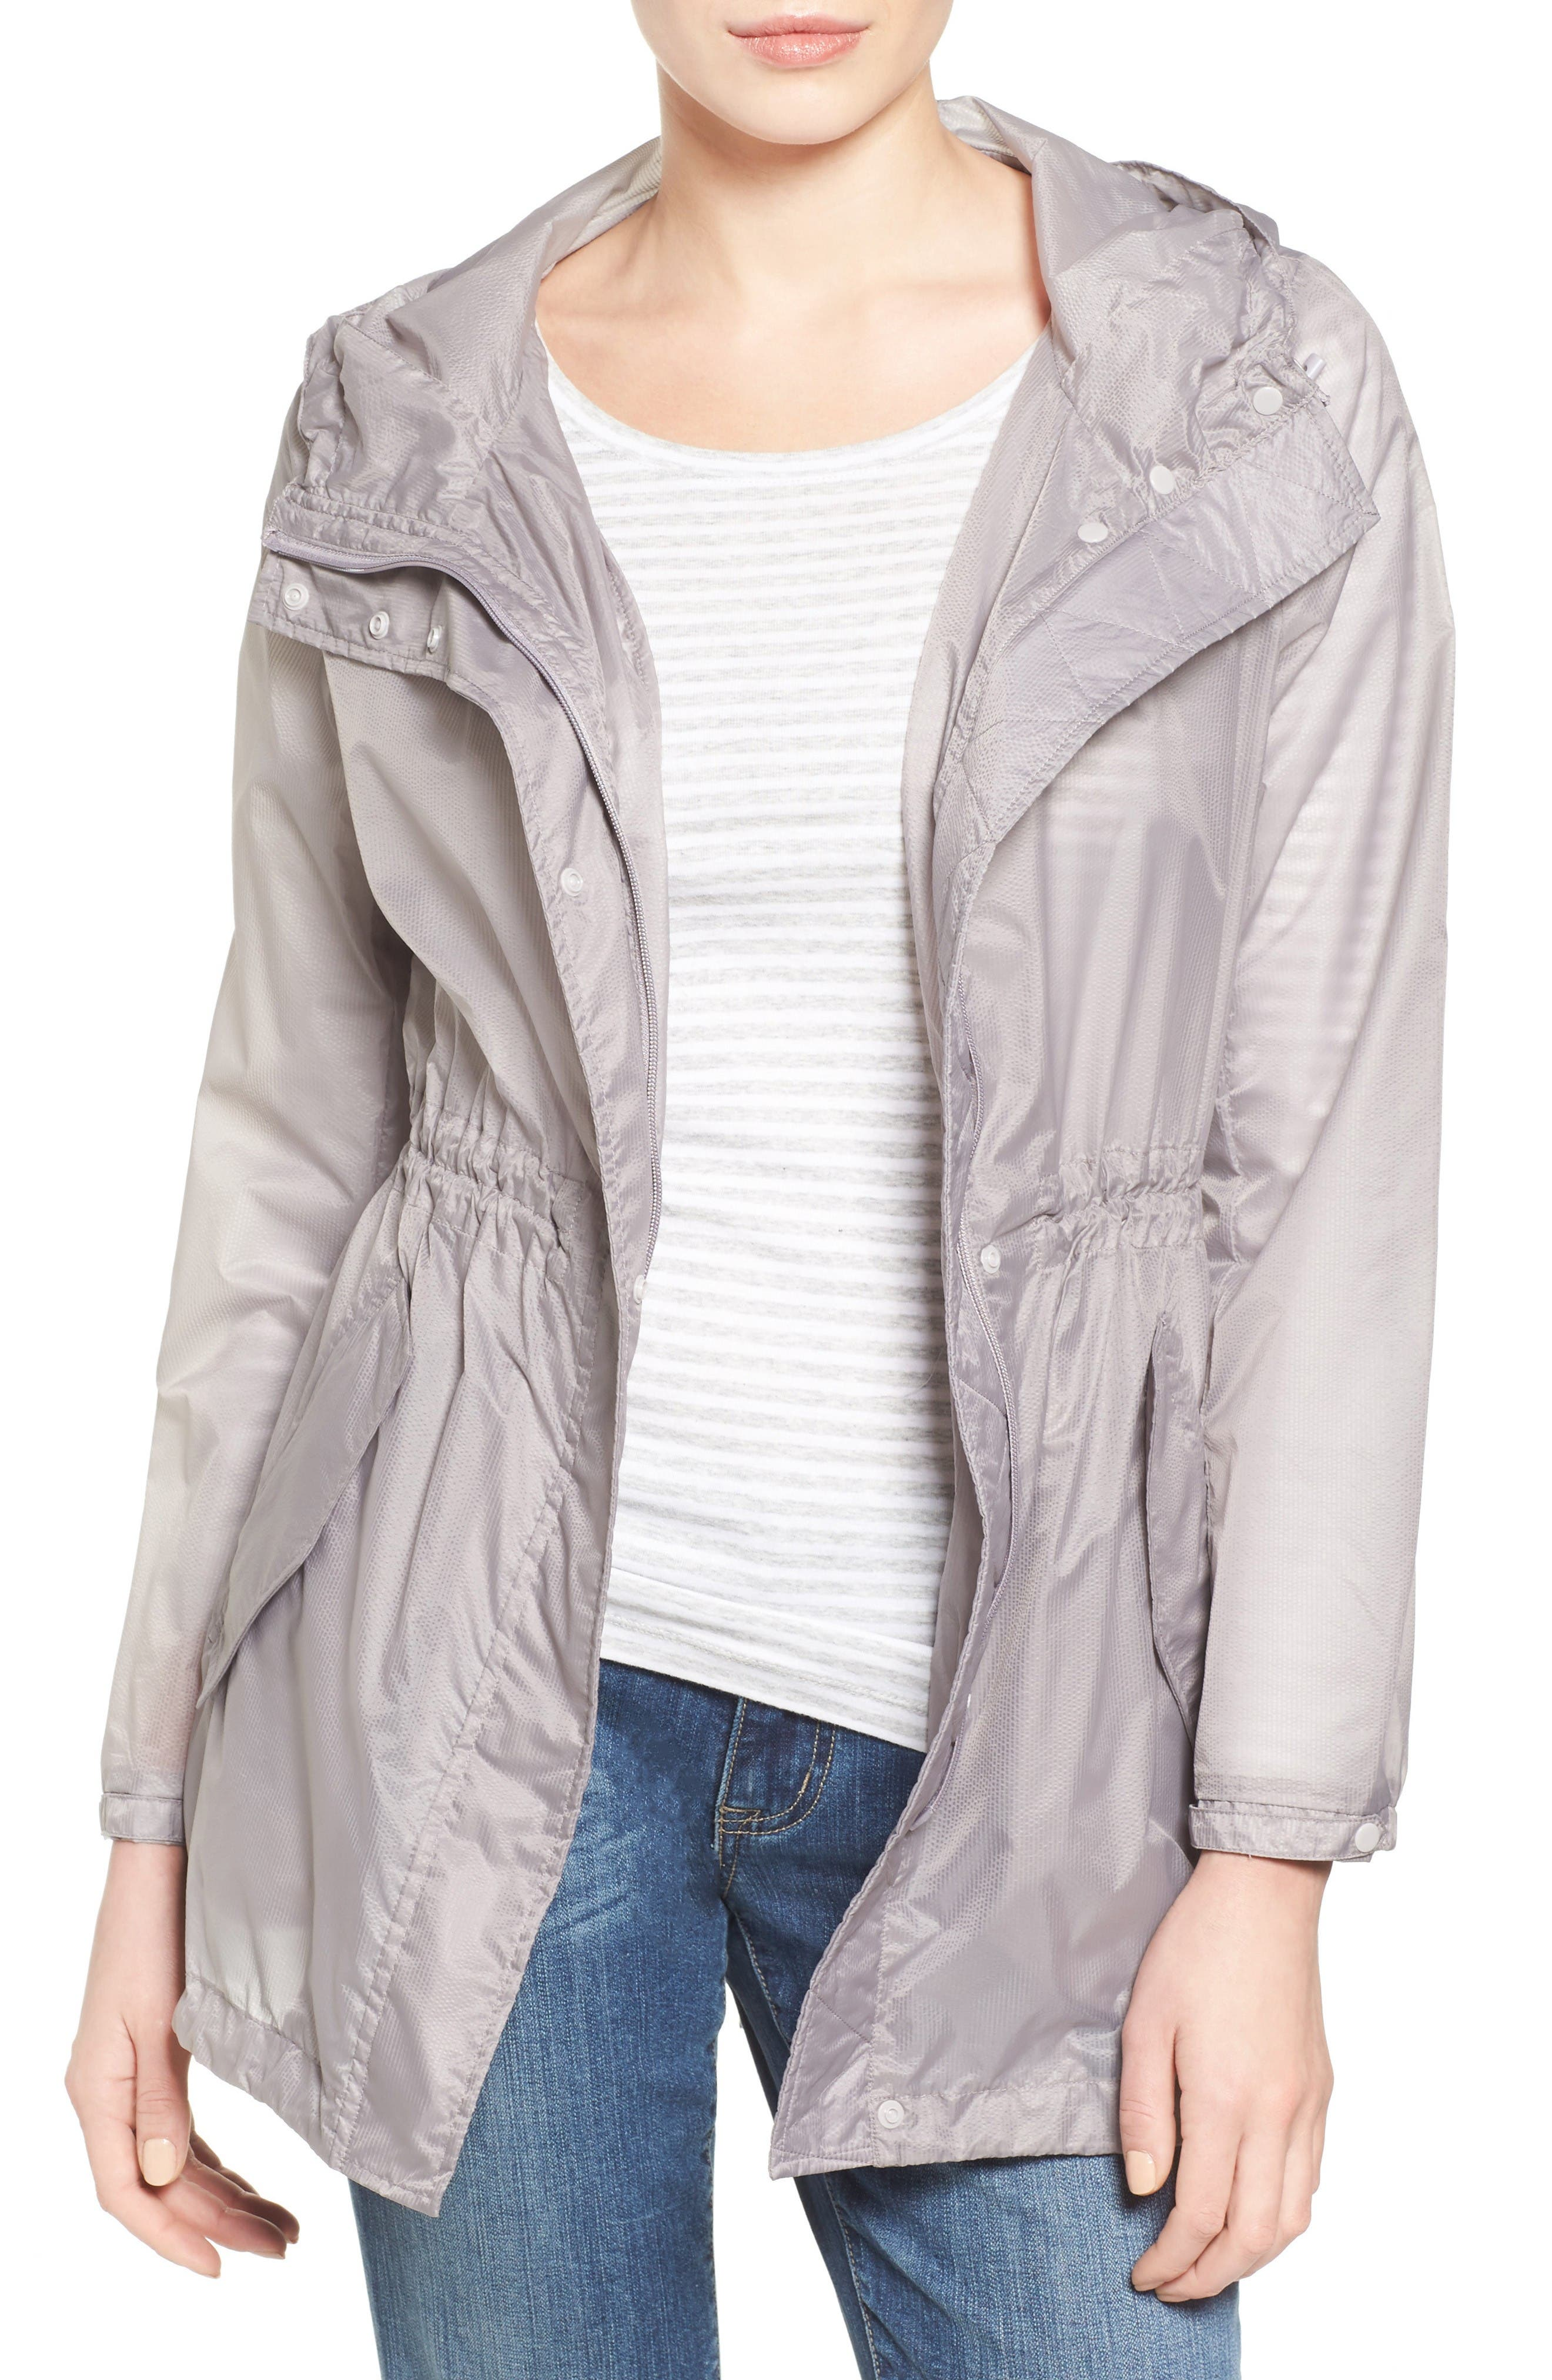 Teri Translucent Rain Jacket,                             Main thumbnail 1, color,                             Fog